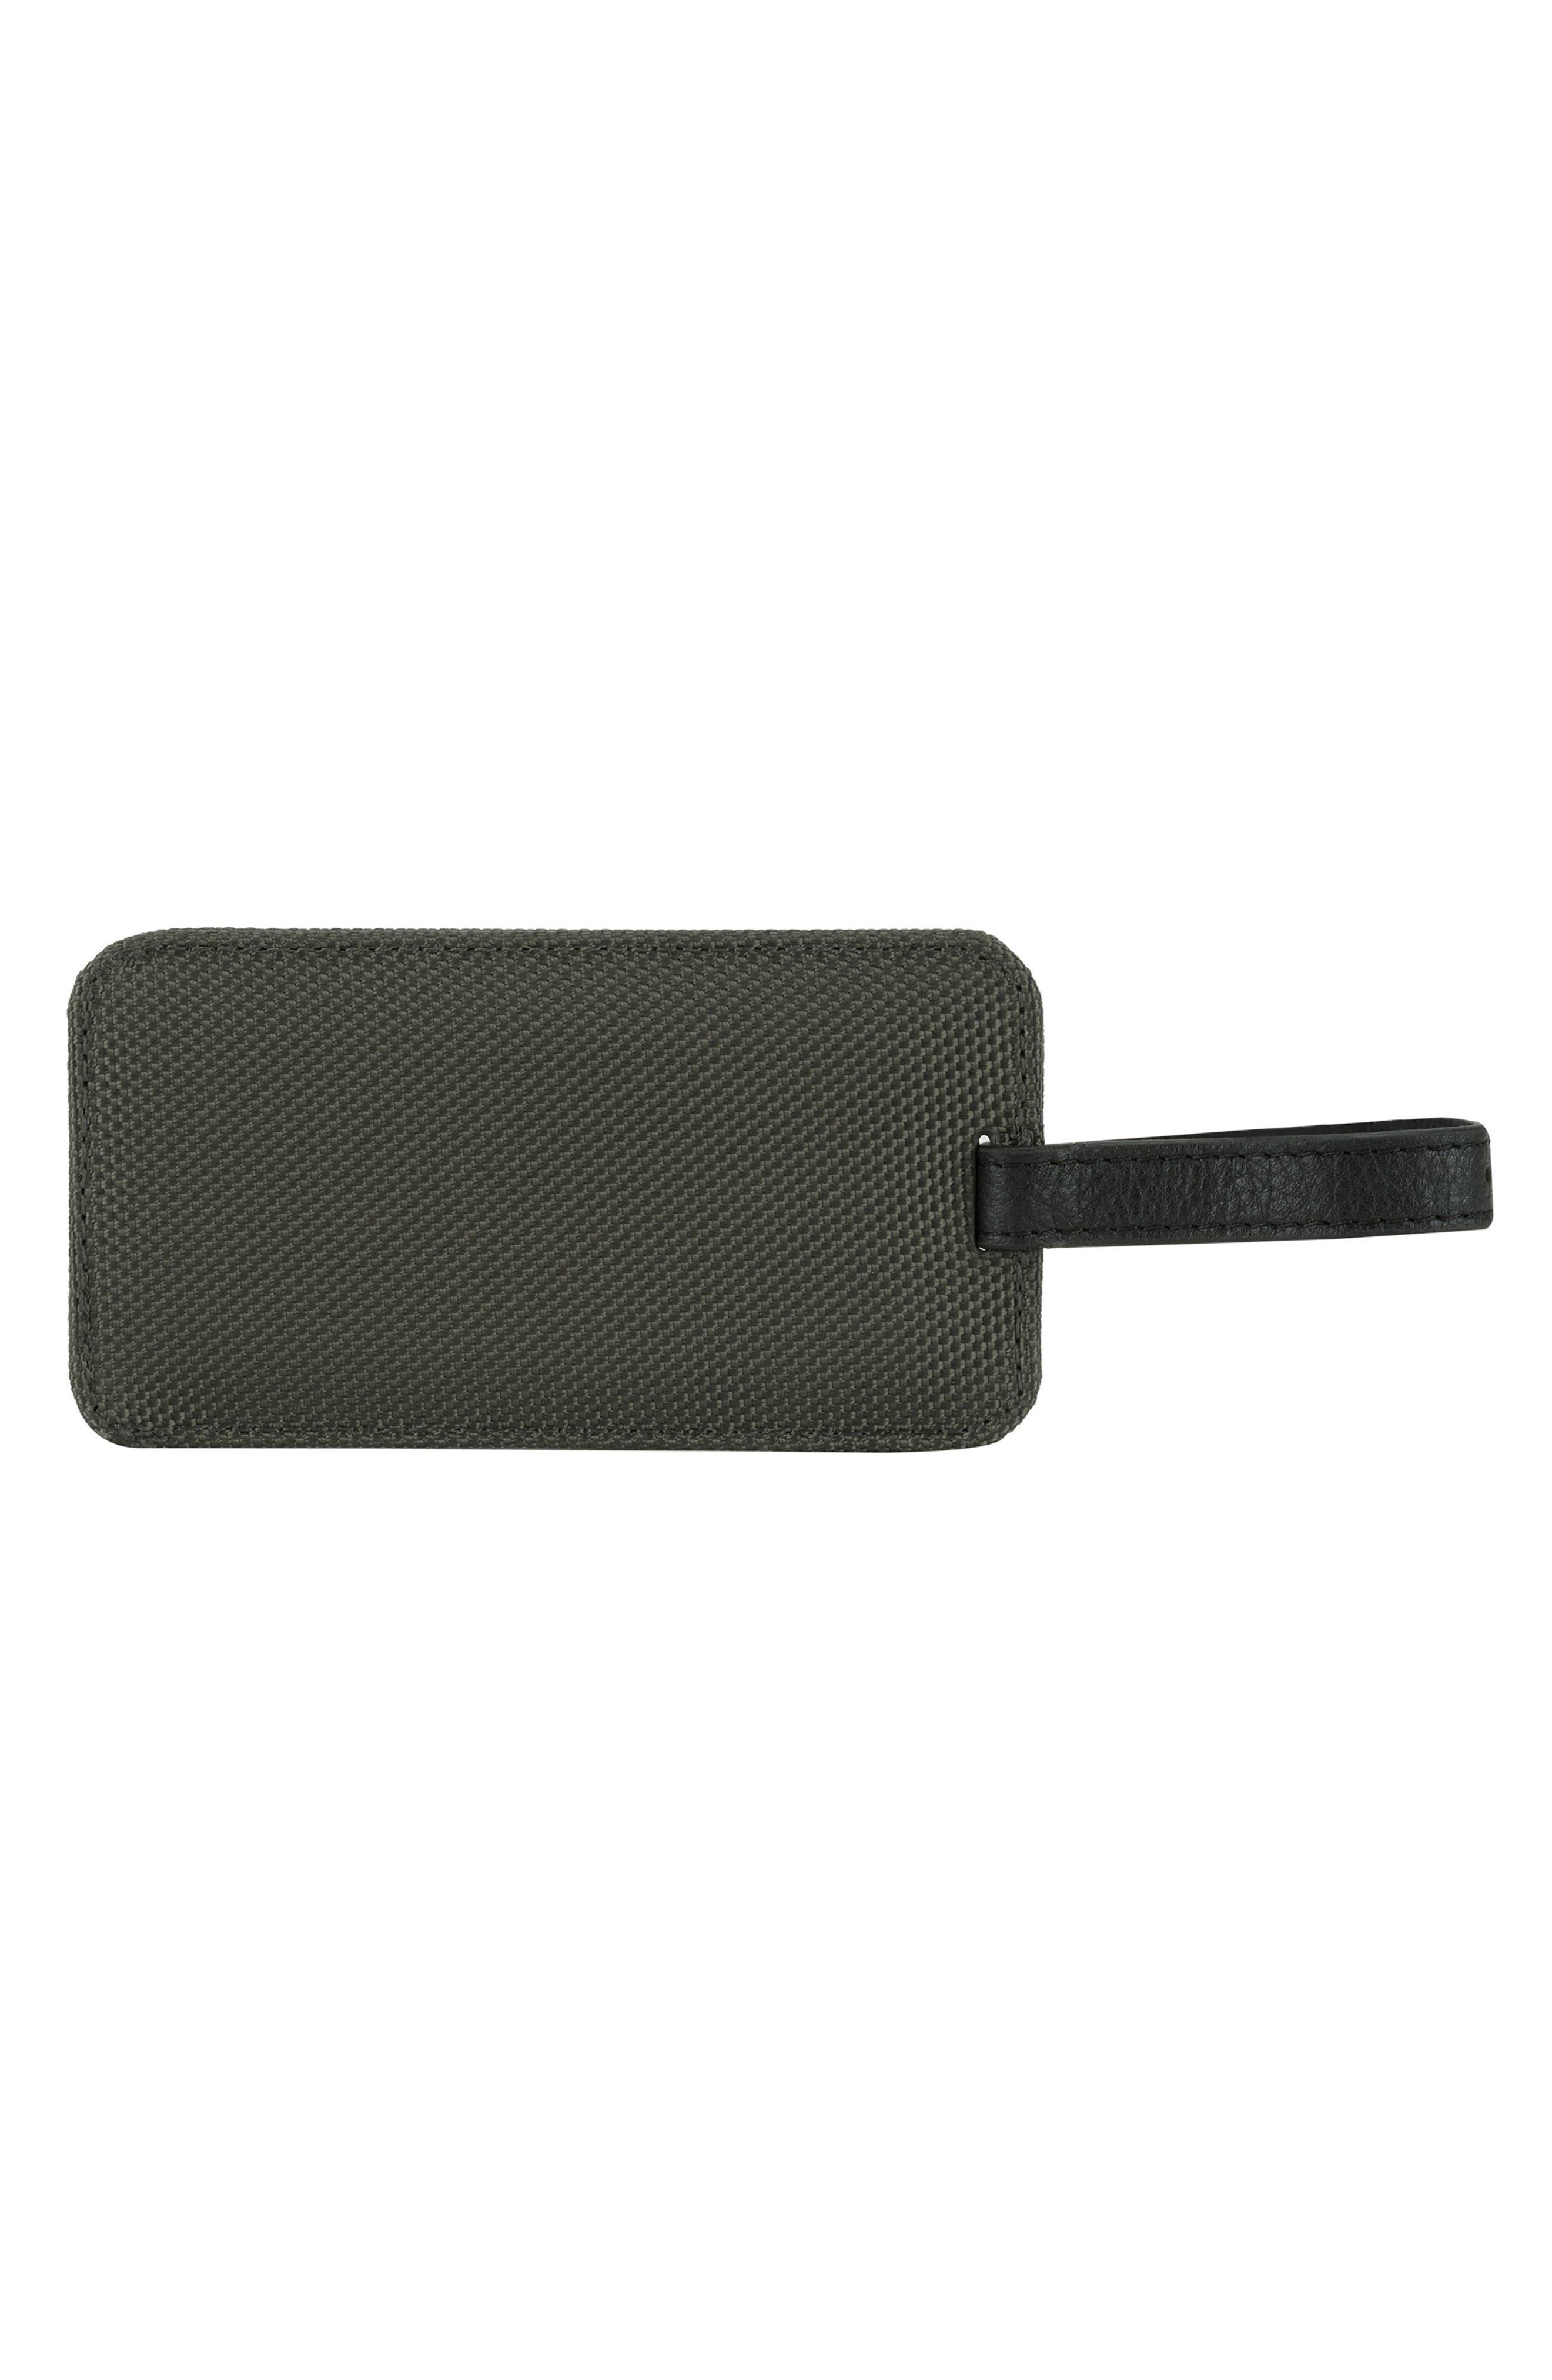 Luggage Tag,                         Main,                         color, Black